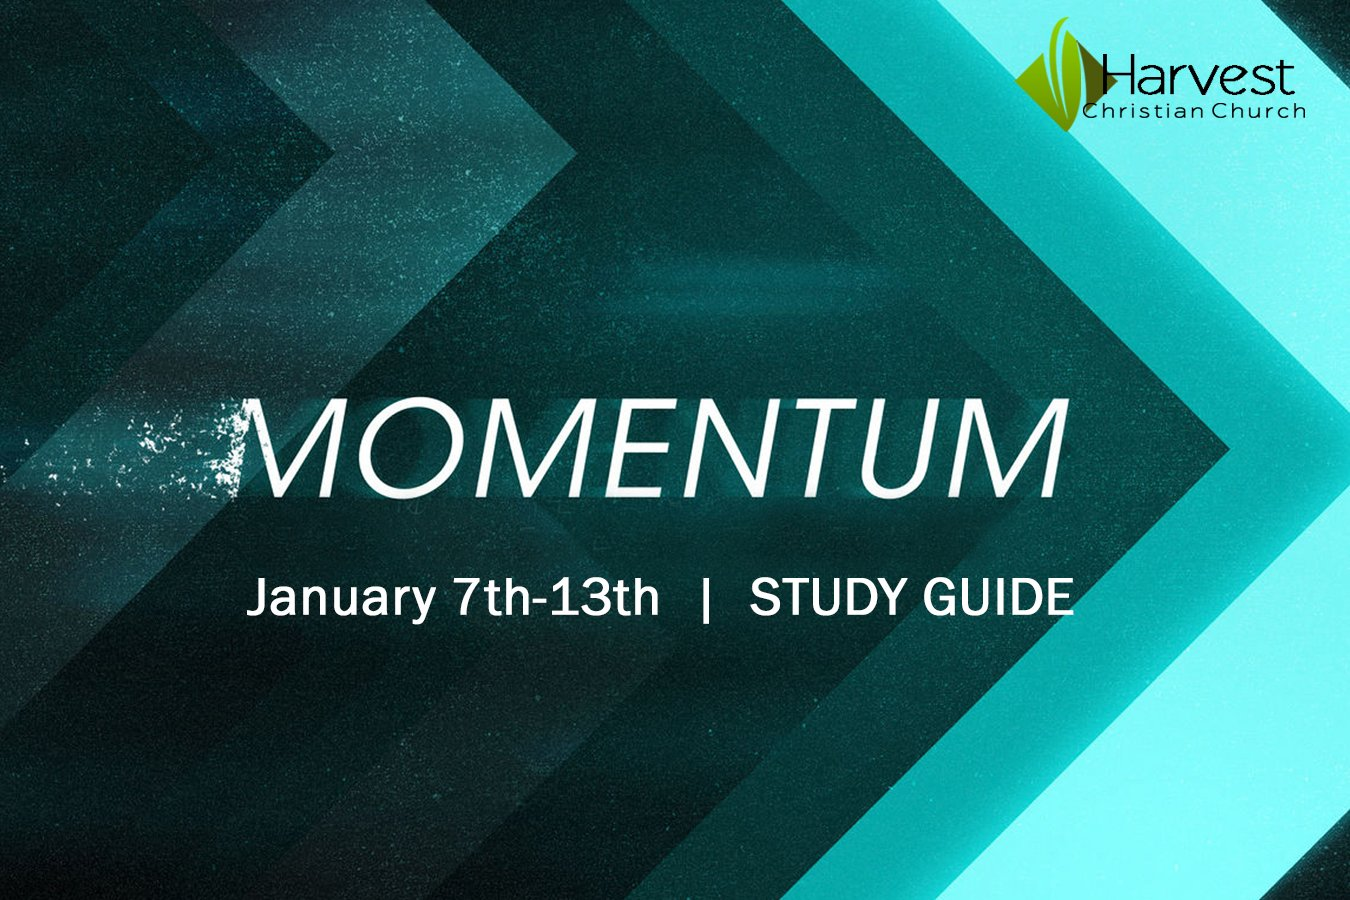 Study Guide: Momentum